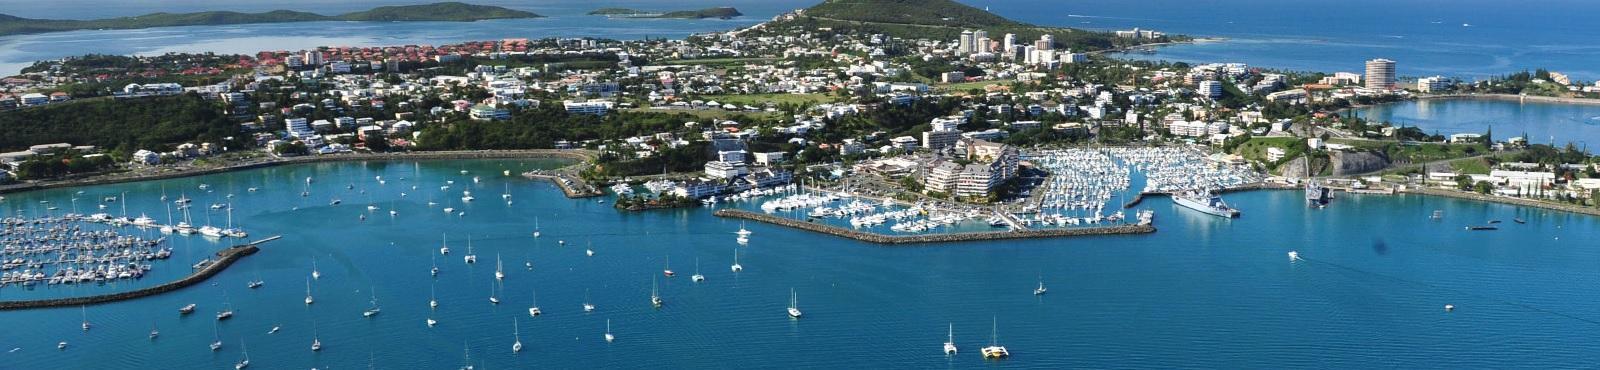 Ville de Nouméa bleue.jpg